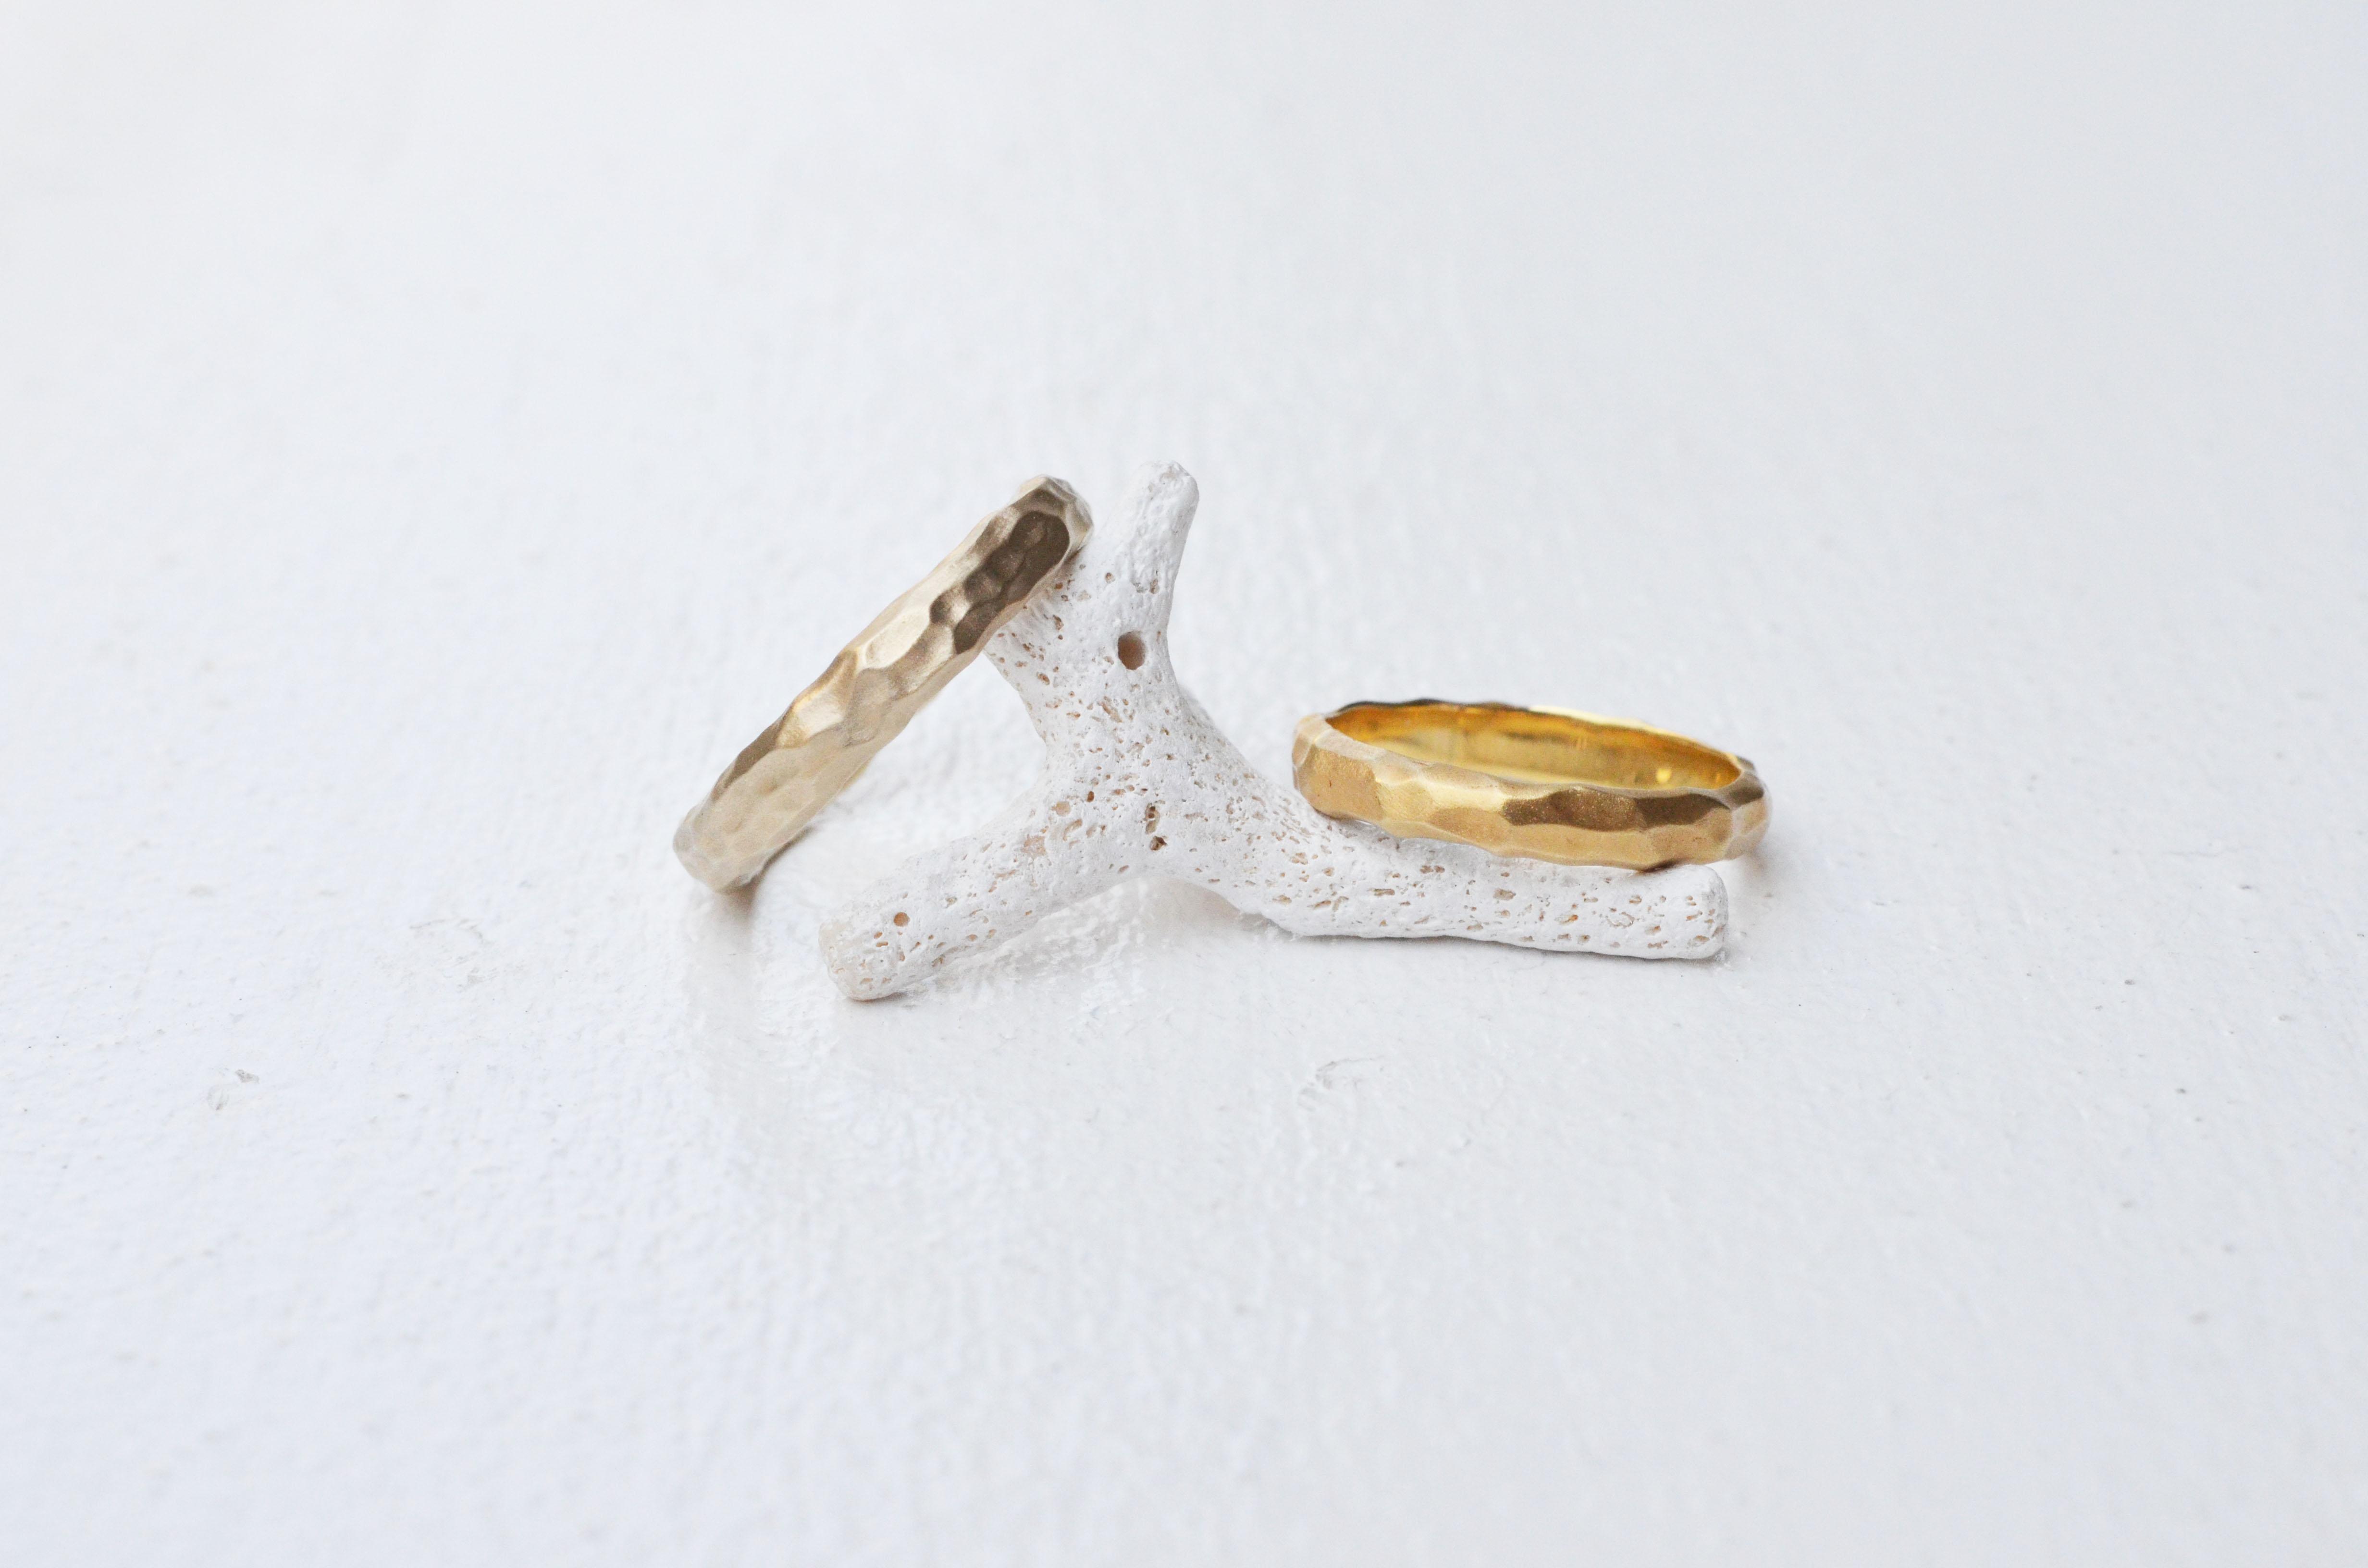 sowiの槌目の結婚指輪「ことこと」